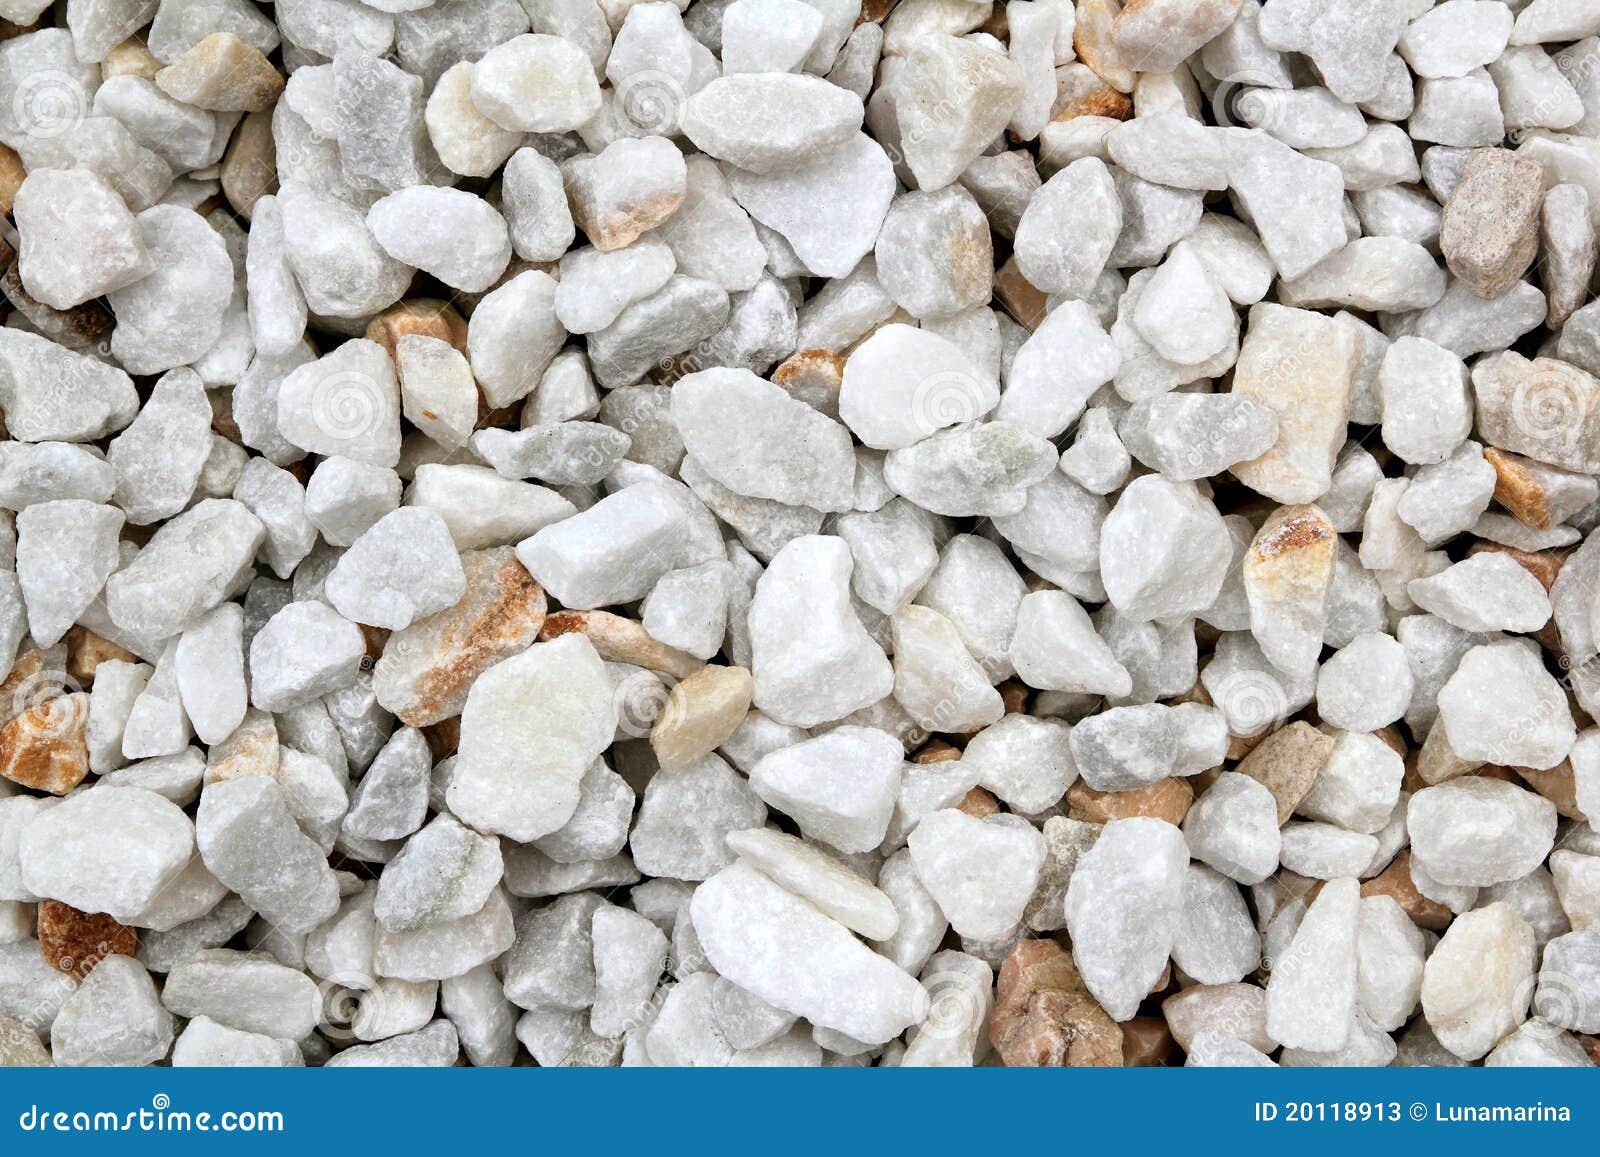 White Decorative Stones : Decorative white marble stone pattern stock image